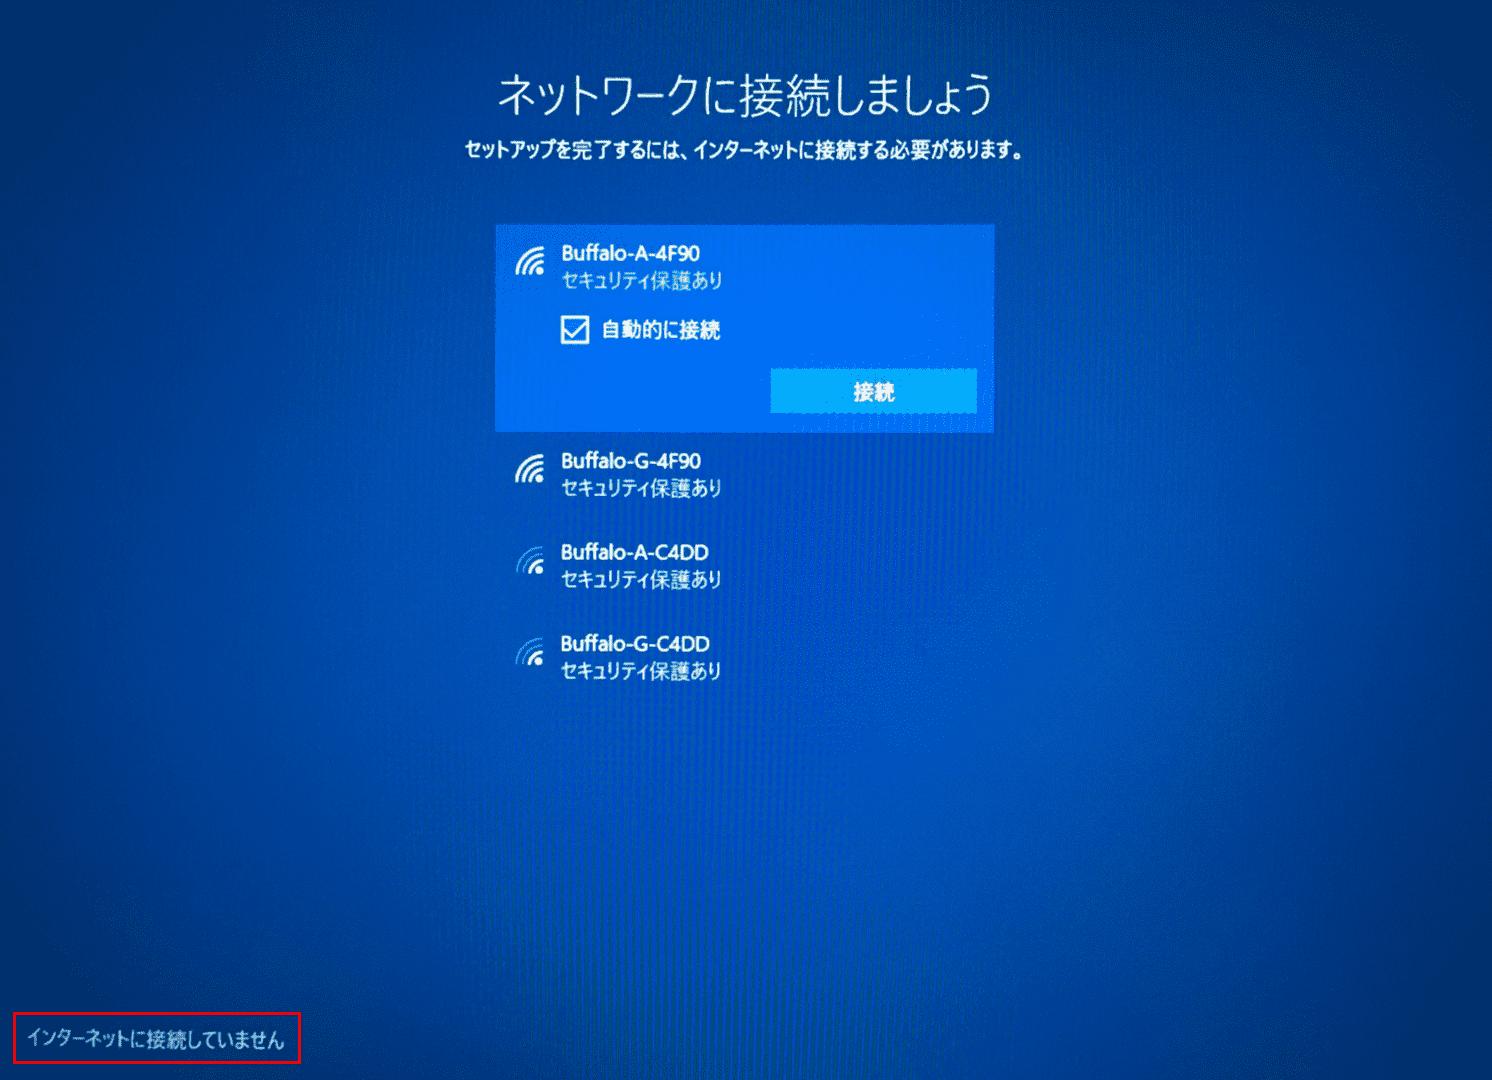 Windows10初期設定、ネットワーク接続設定